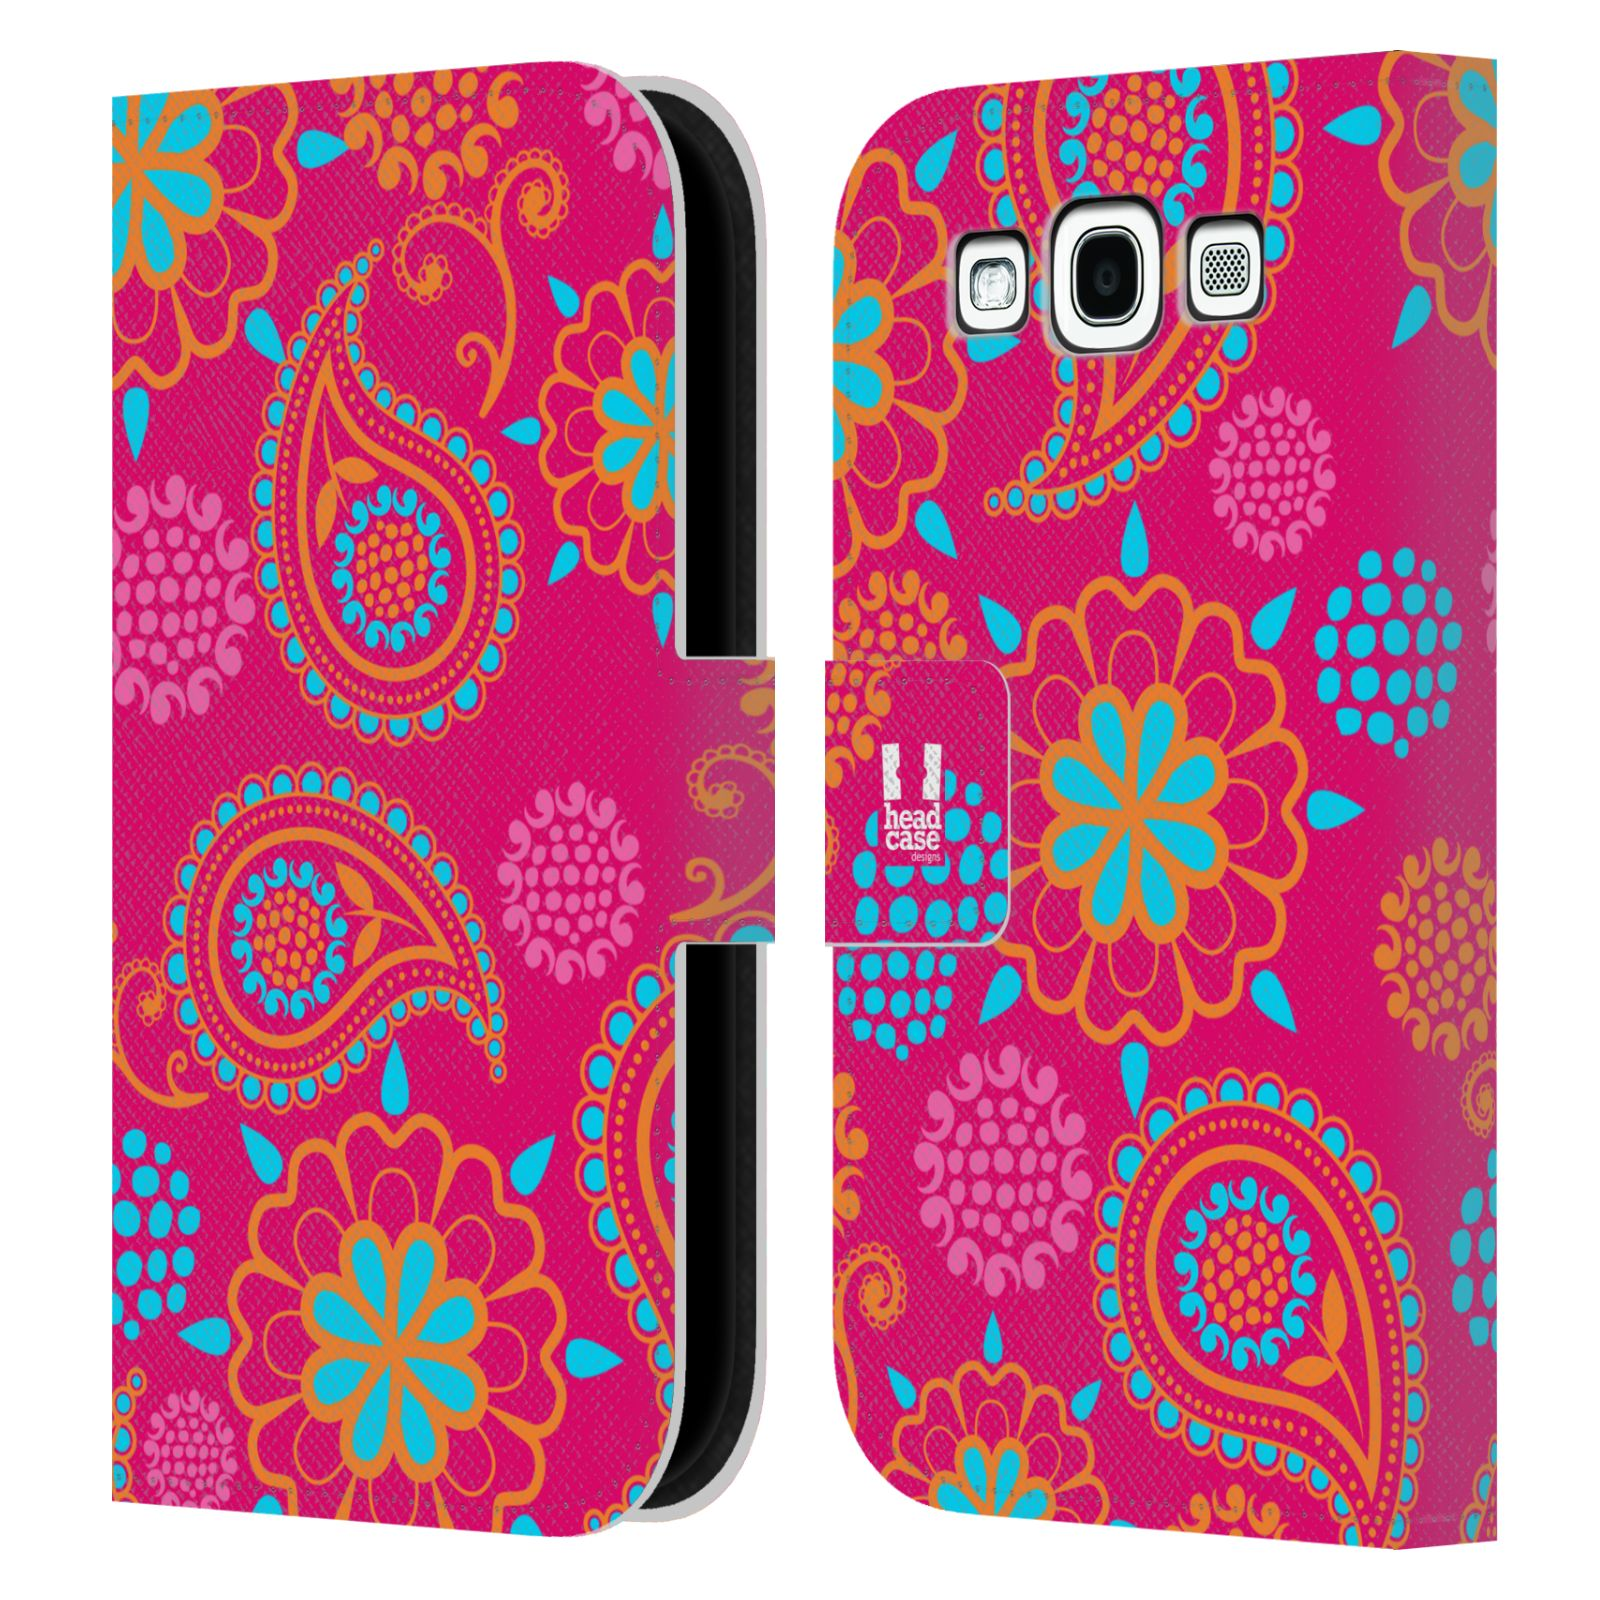 HEAD CASE Flipové pouzdro pro mobil Samsung Galaxy S3 snové slzy růžová